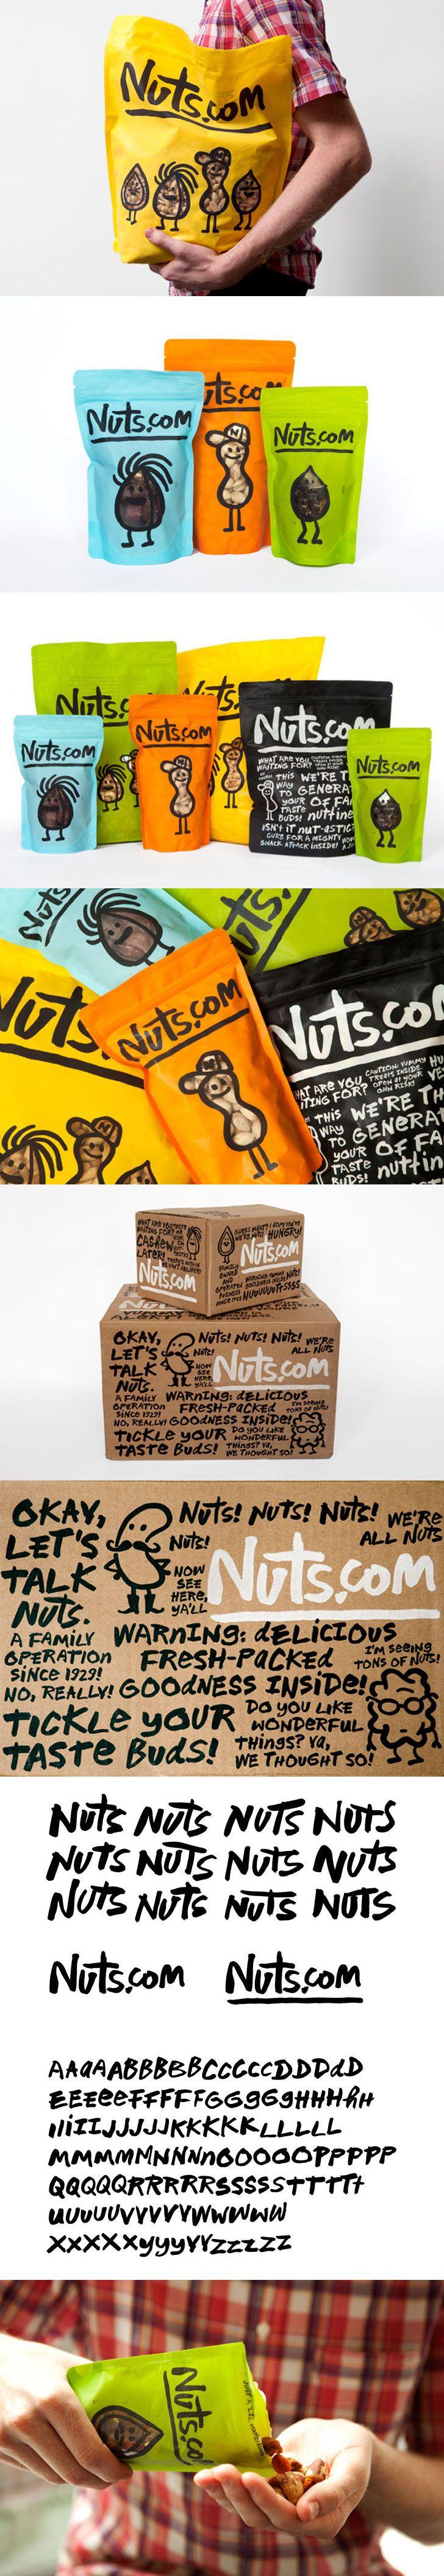 #Nuts.com #packaging #Design #Pentagram #Illustrations